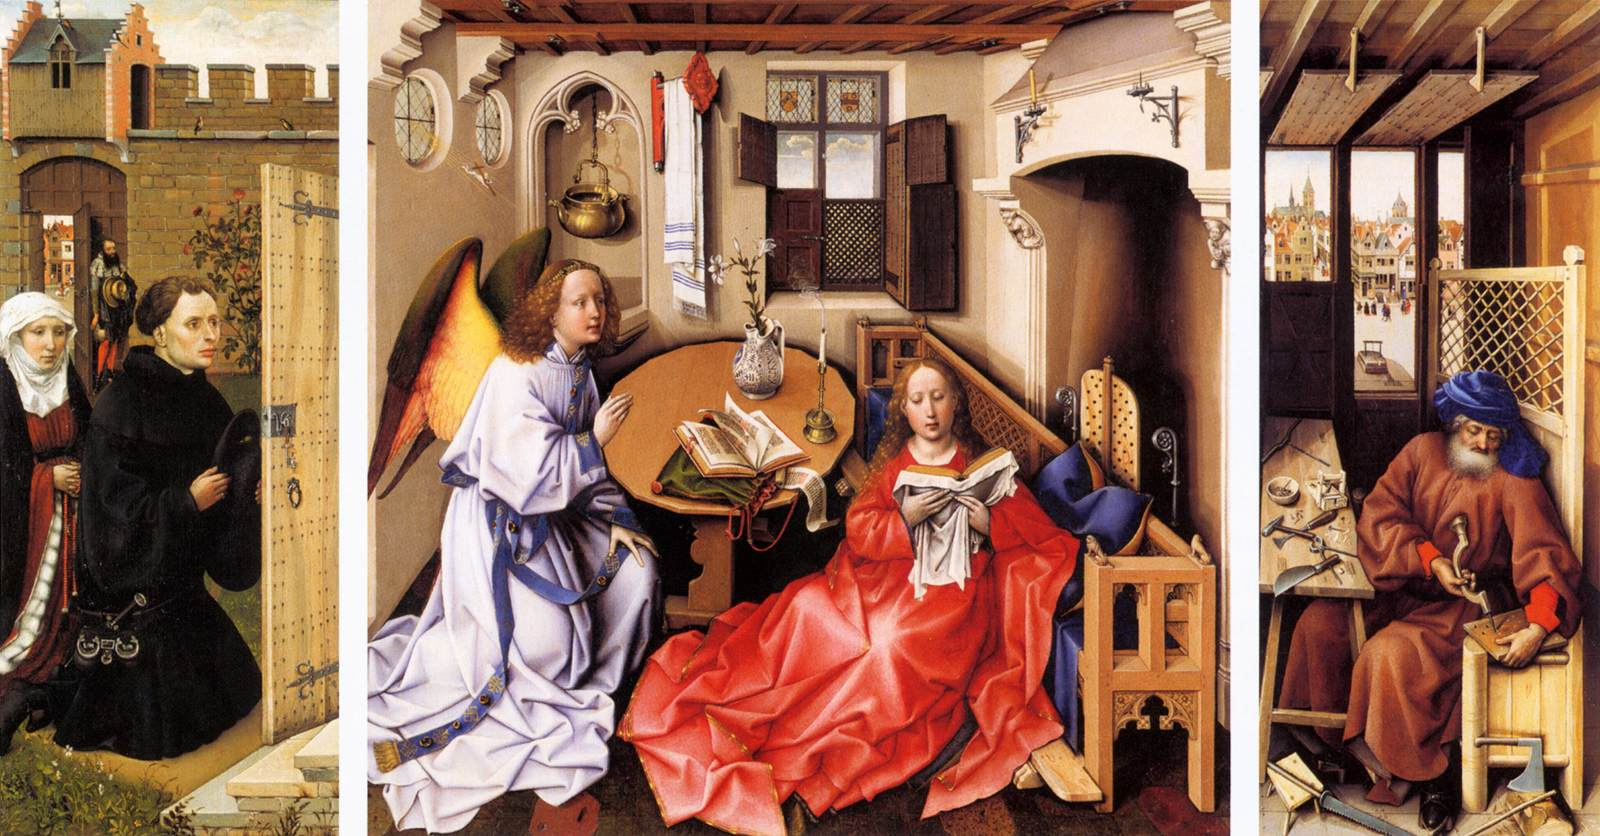 Annunciation Triptych (Merode Altarpiece) by Robert Campin